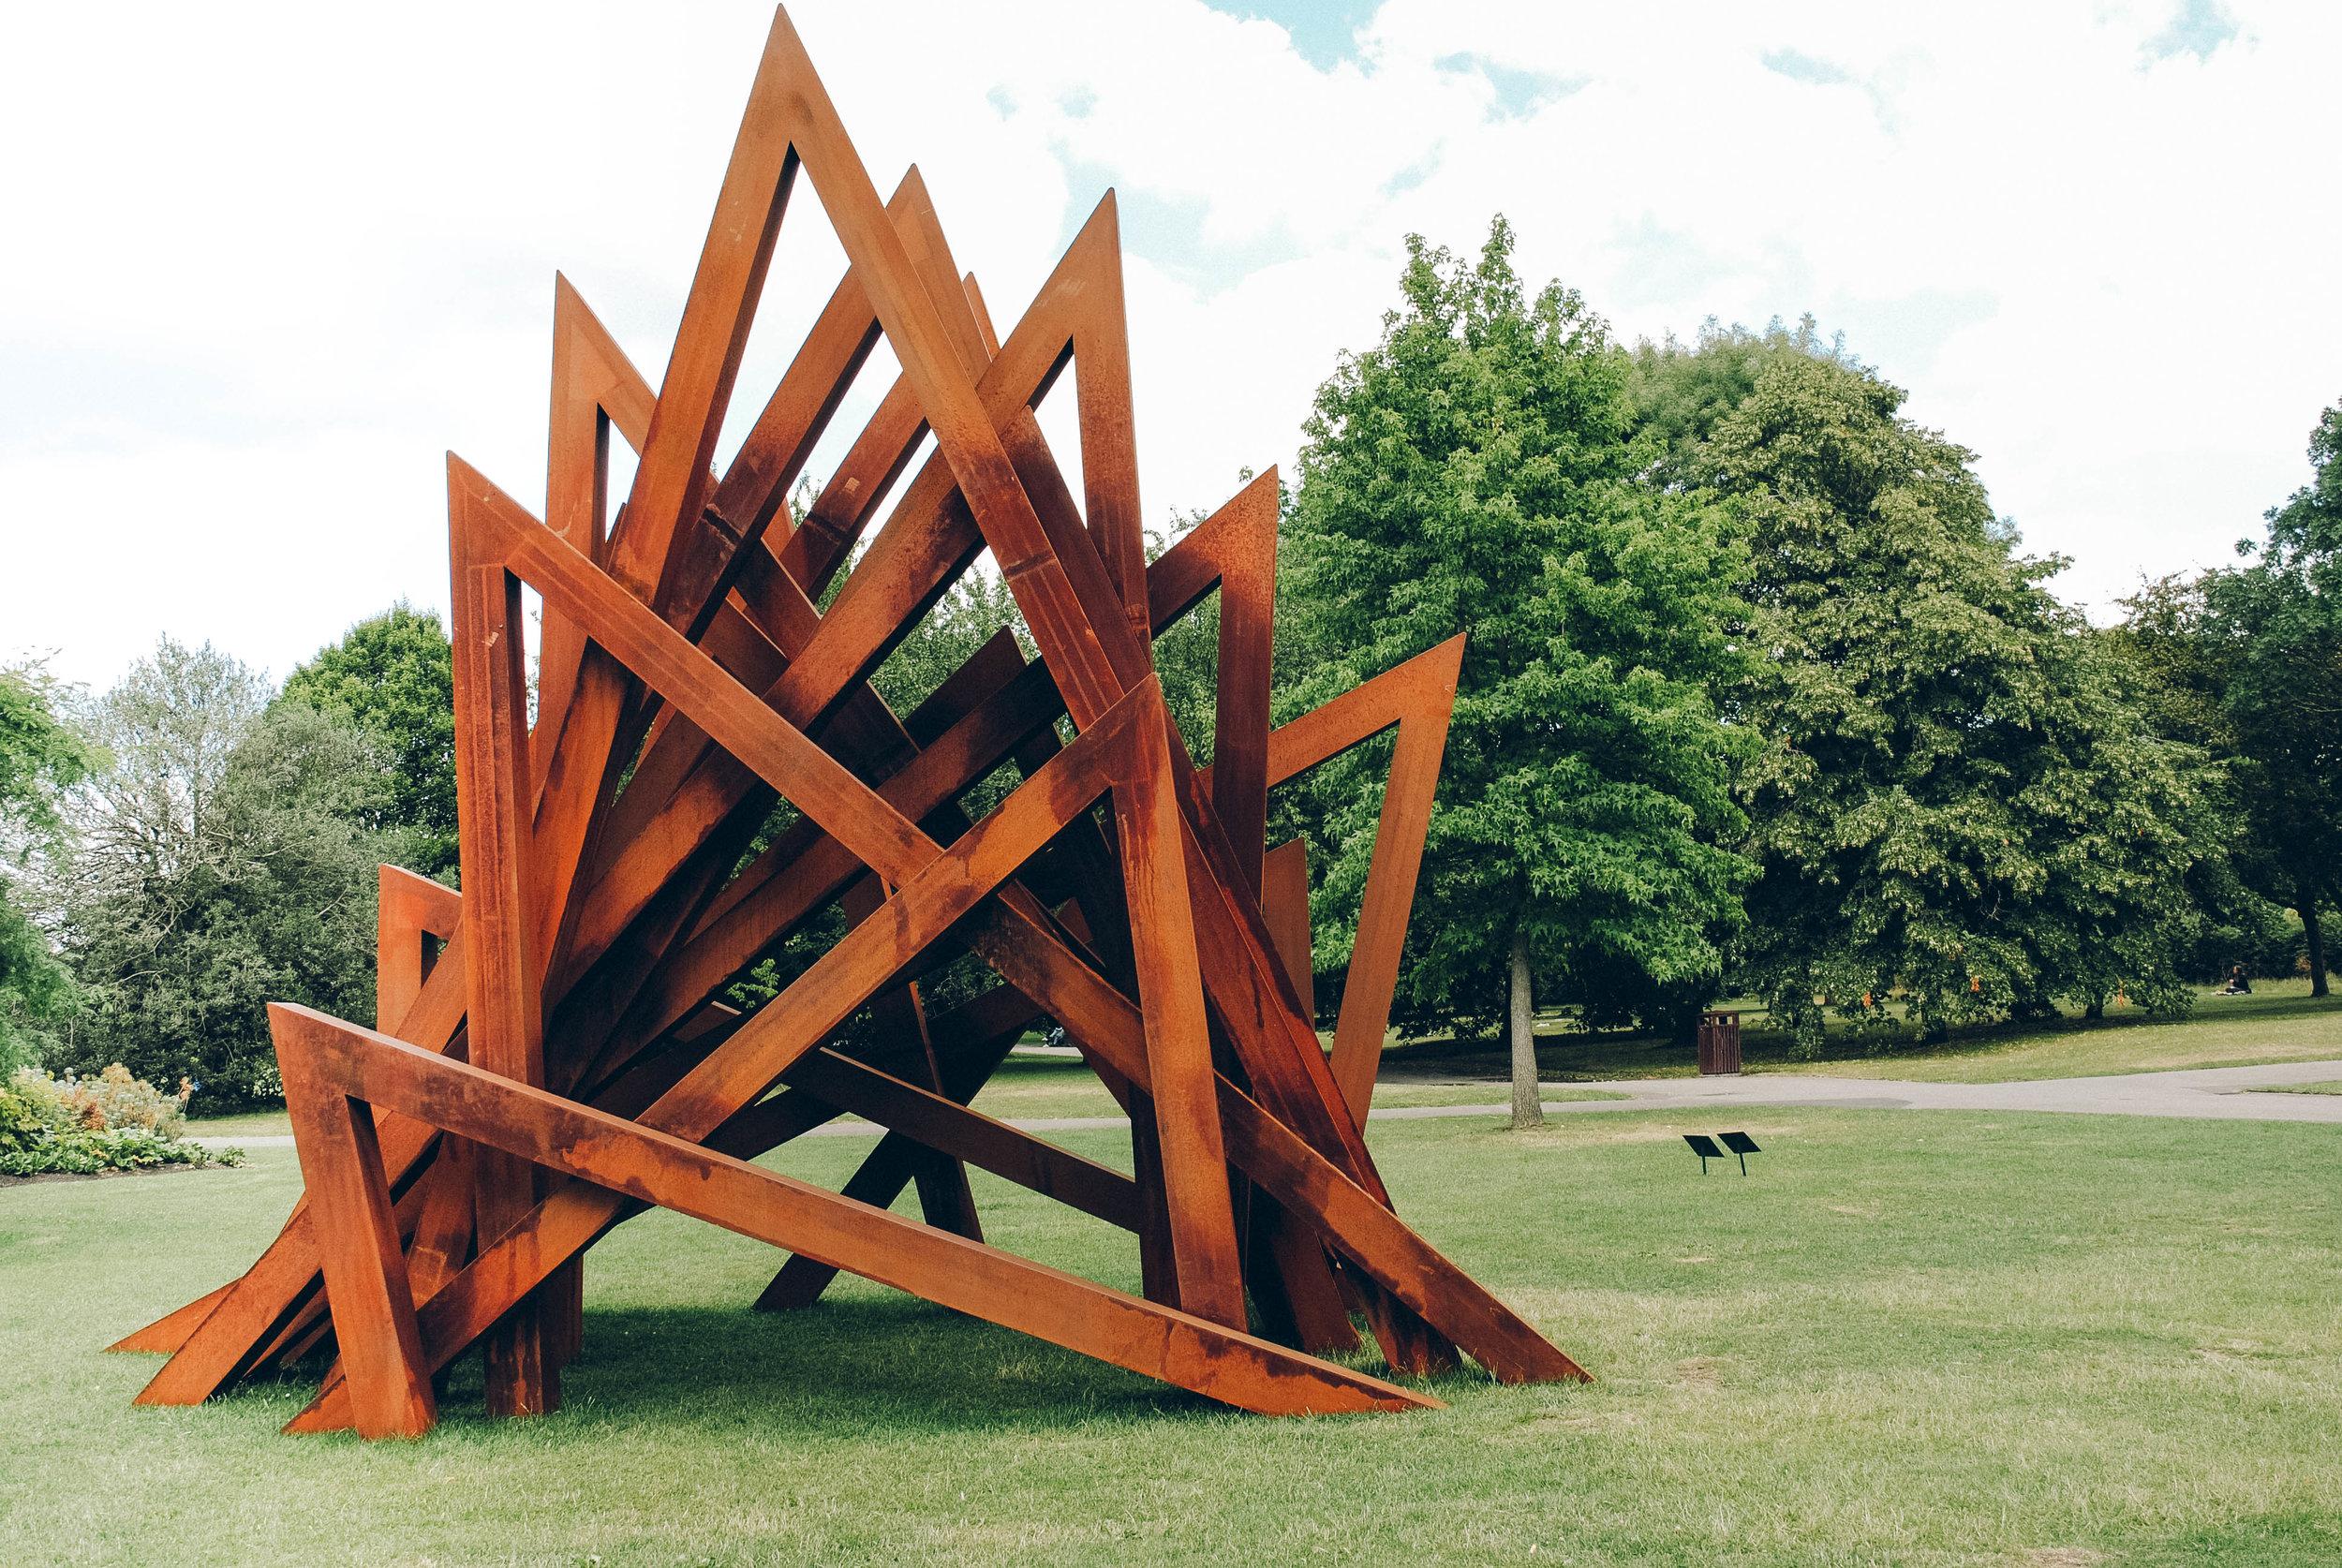 frieze sculpture regents park (9 of 15).jpg